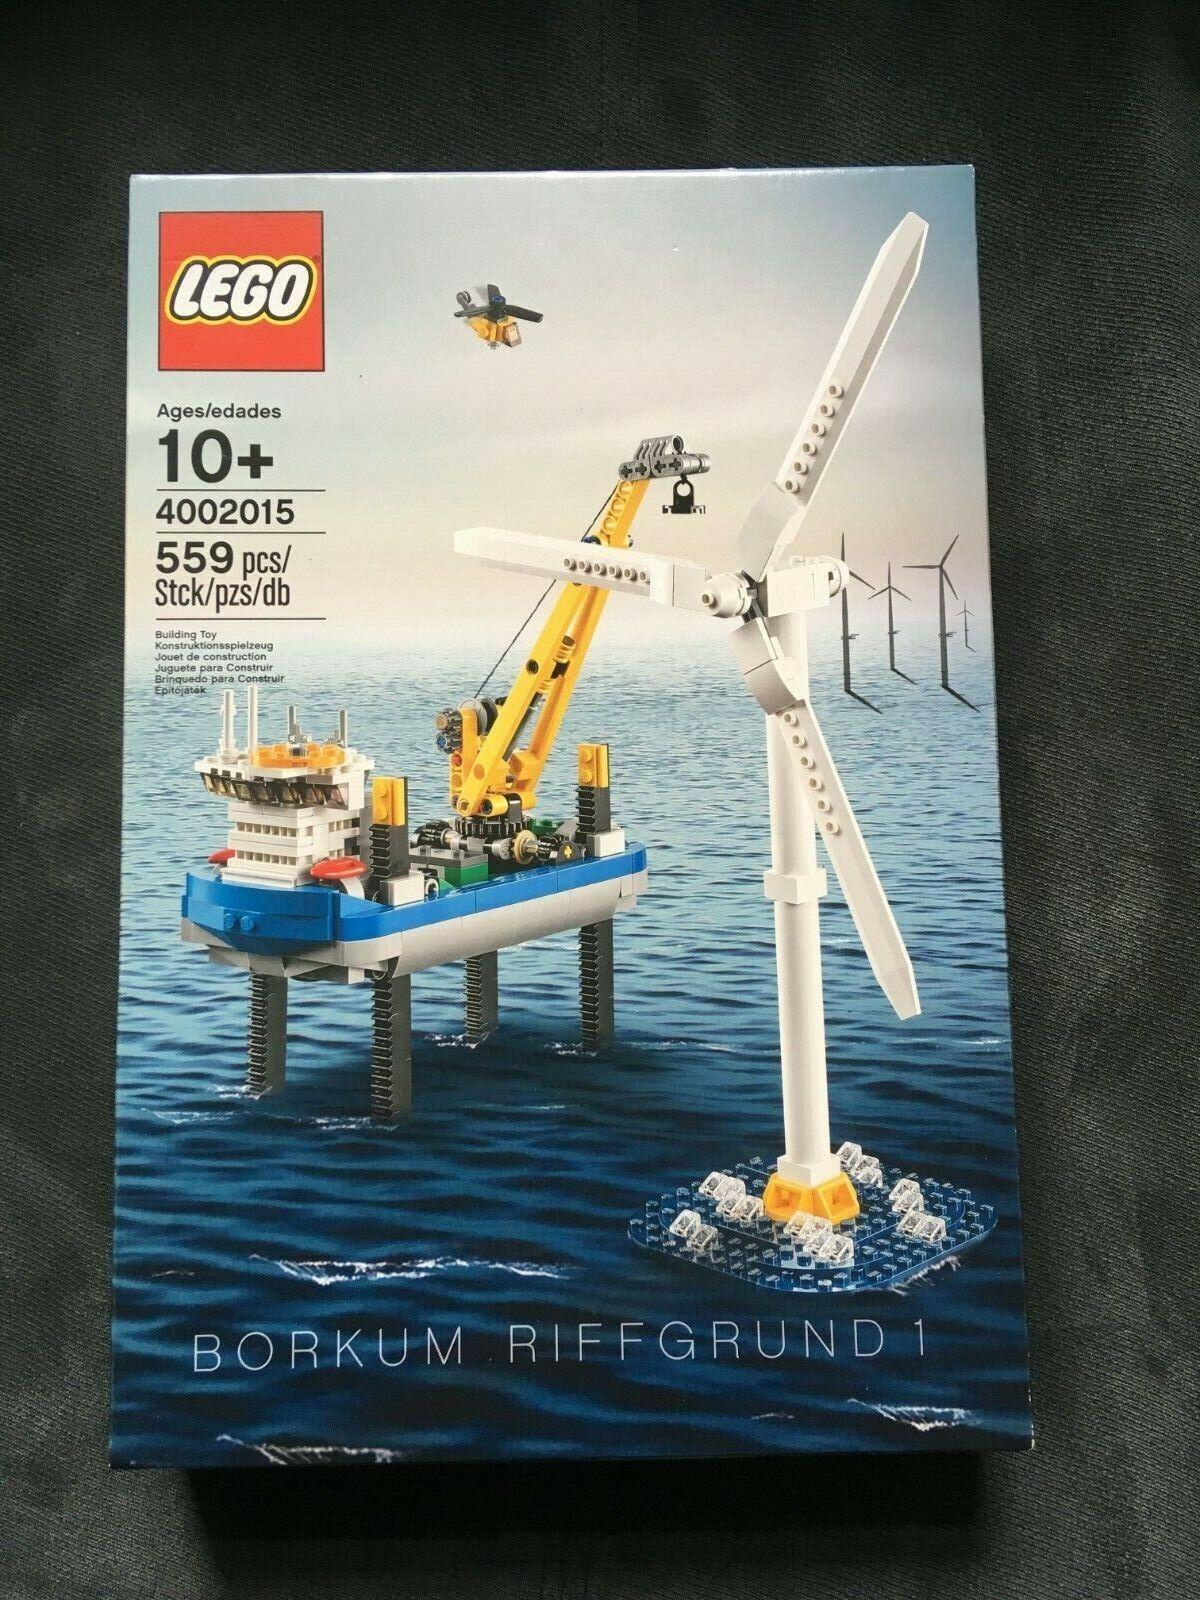 LEGO 4002015 4002015 4002015 Borkum Riffgrund 1 e9b301